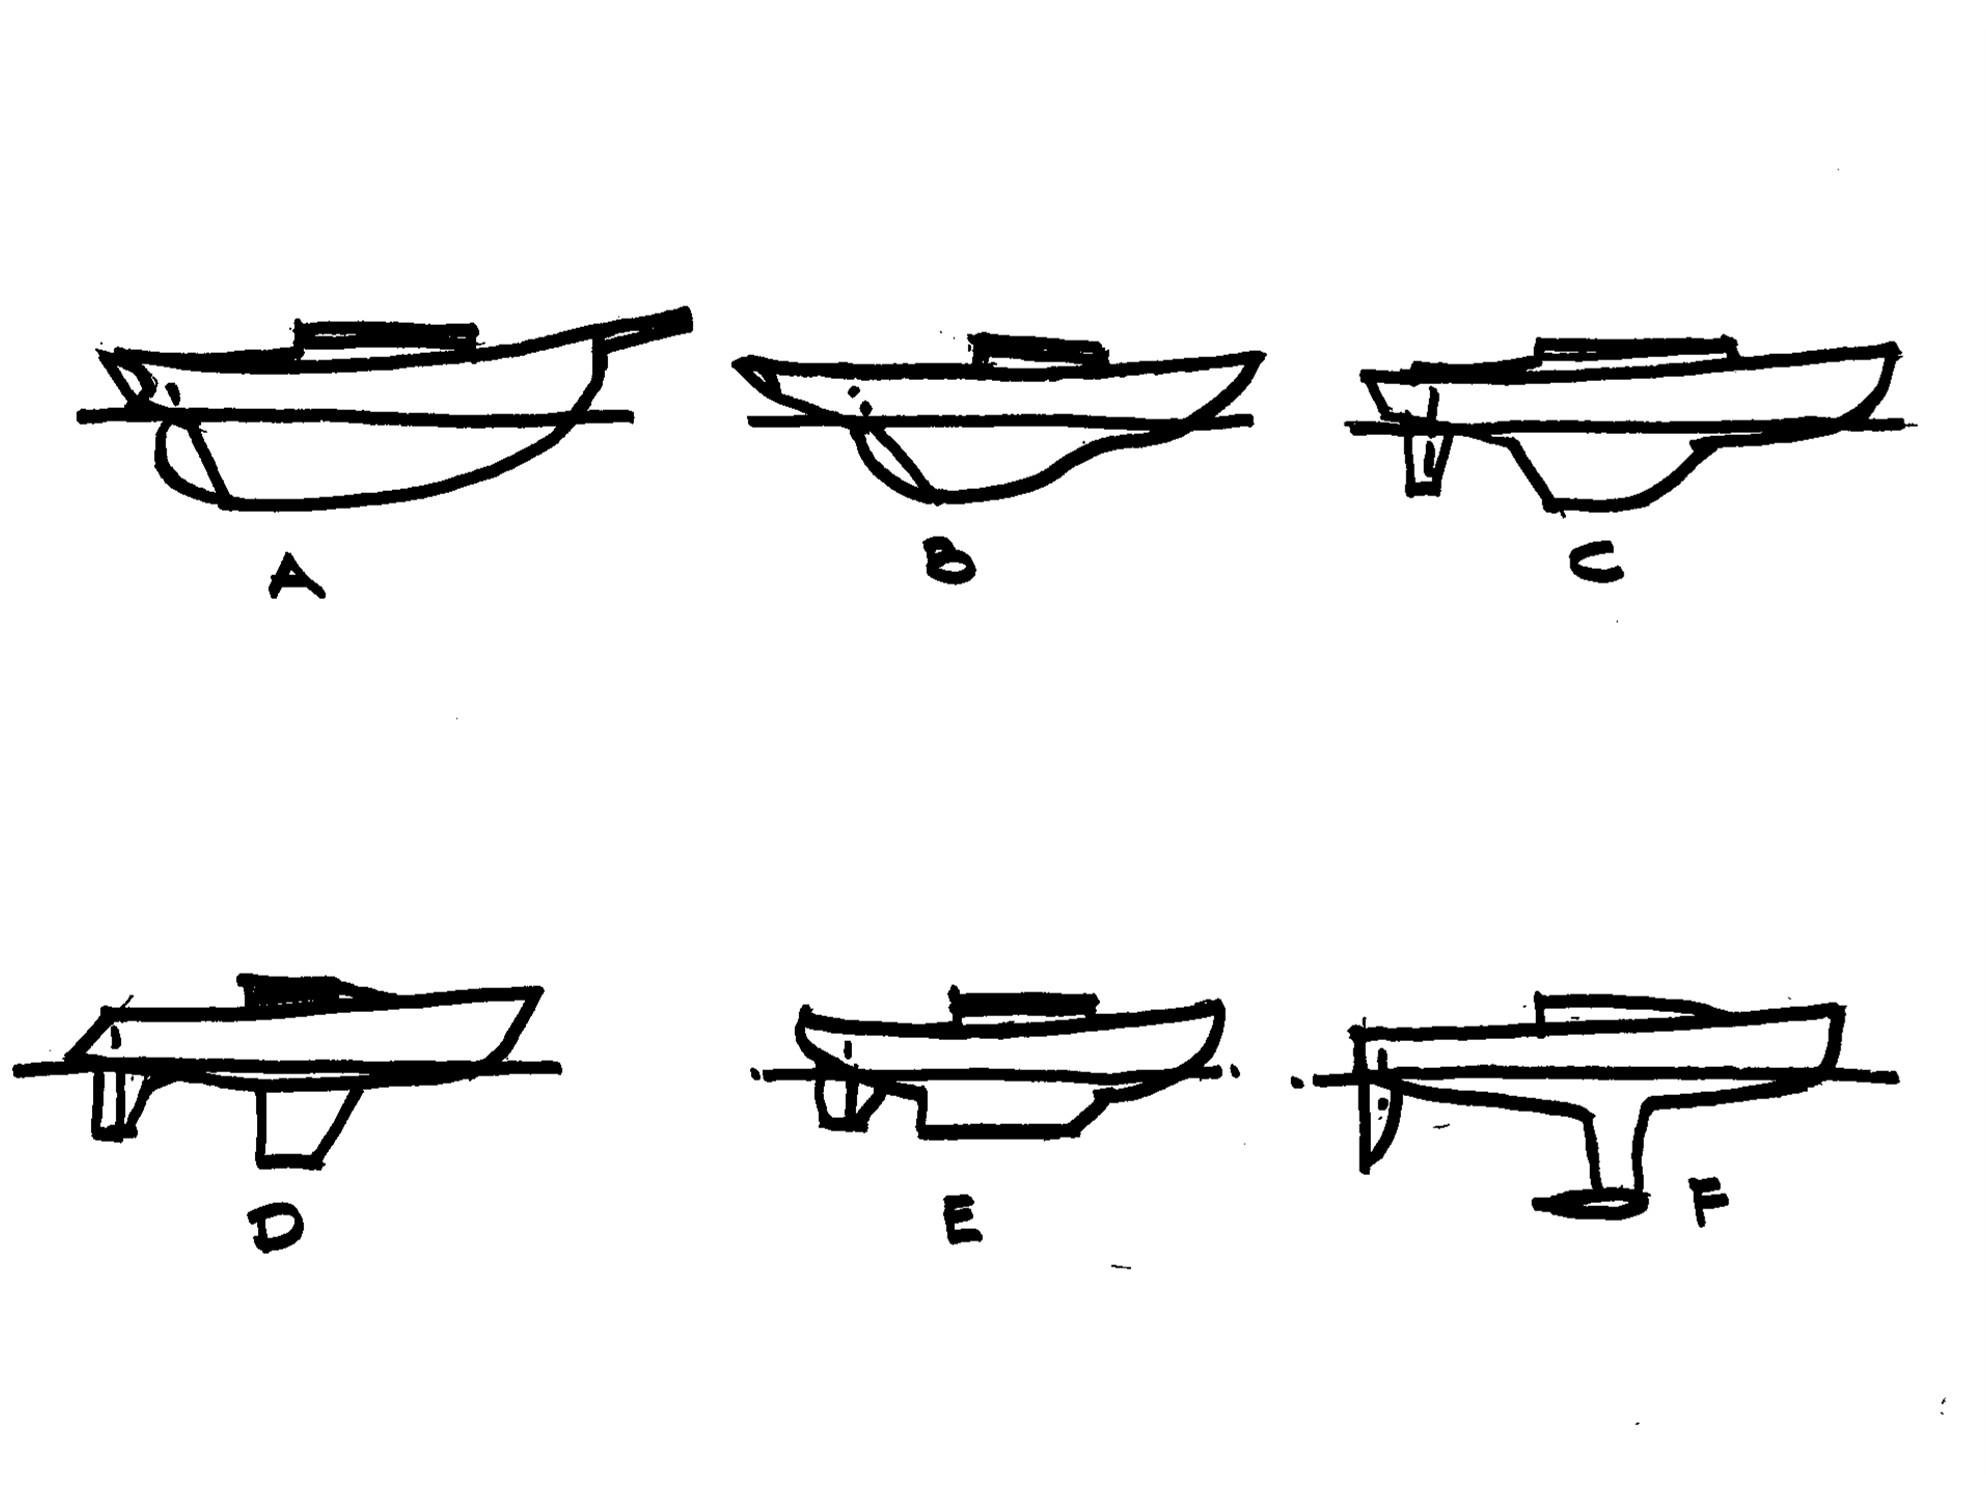 Keel Type Profiles